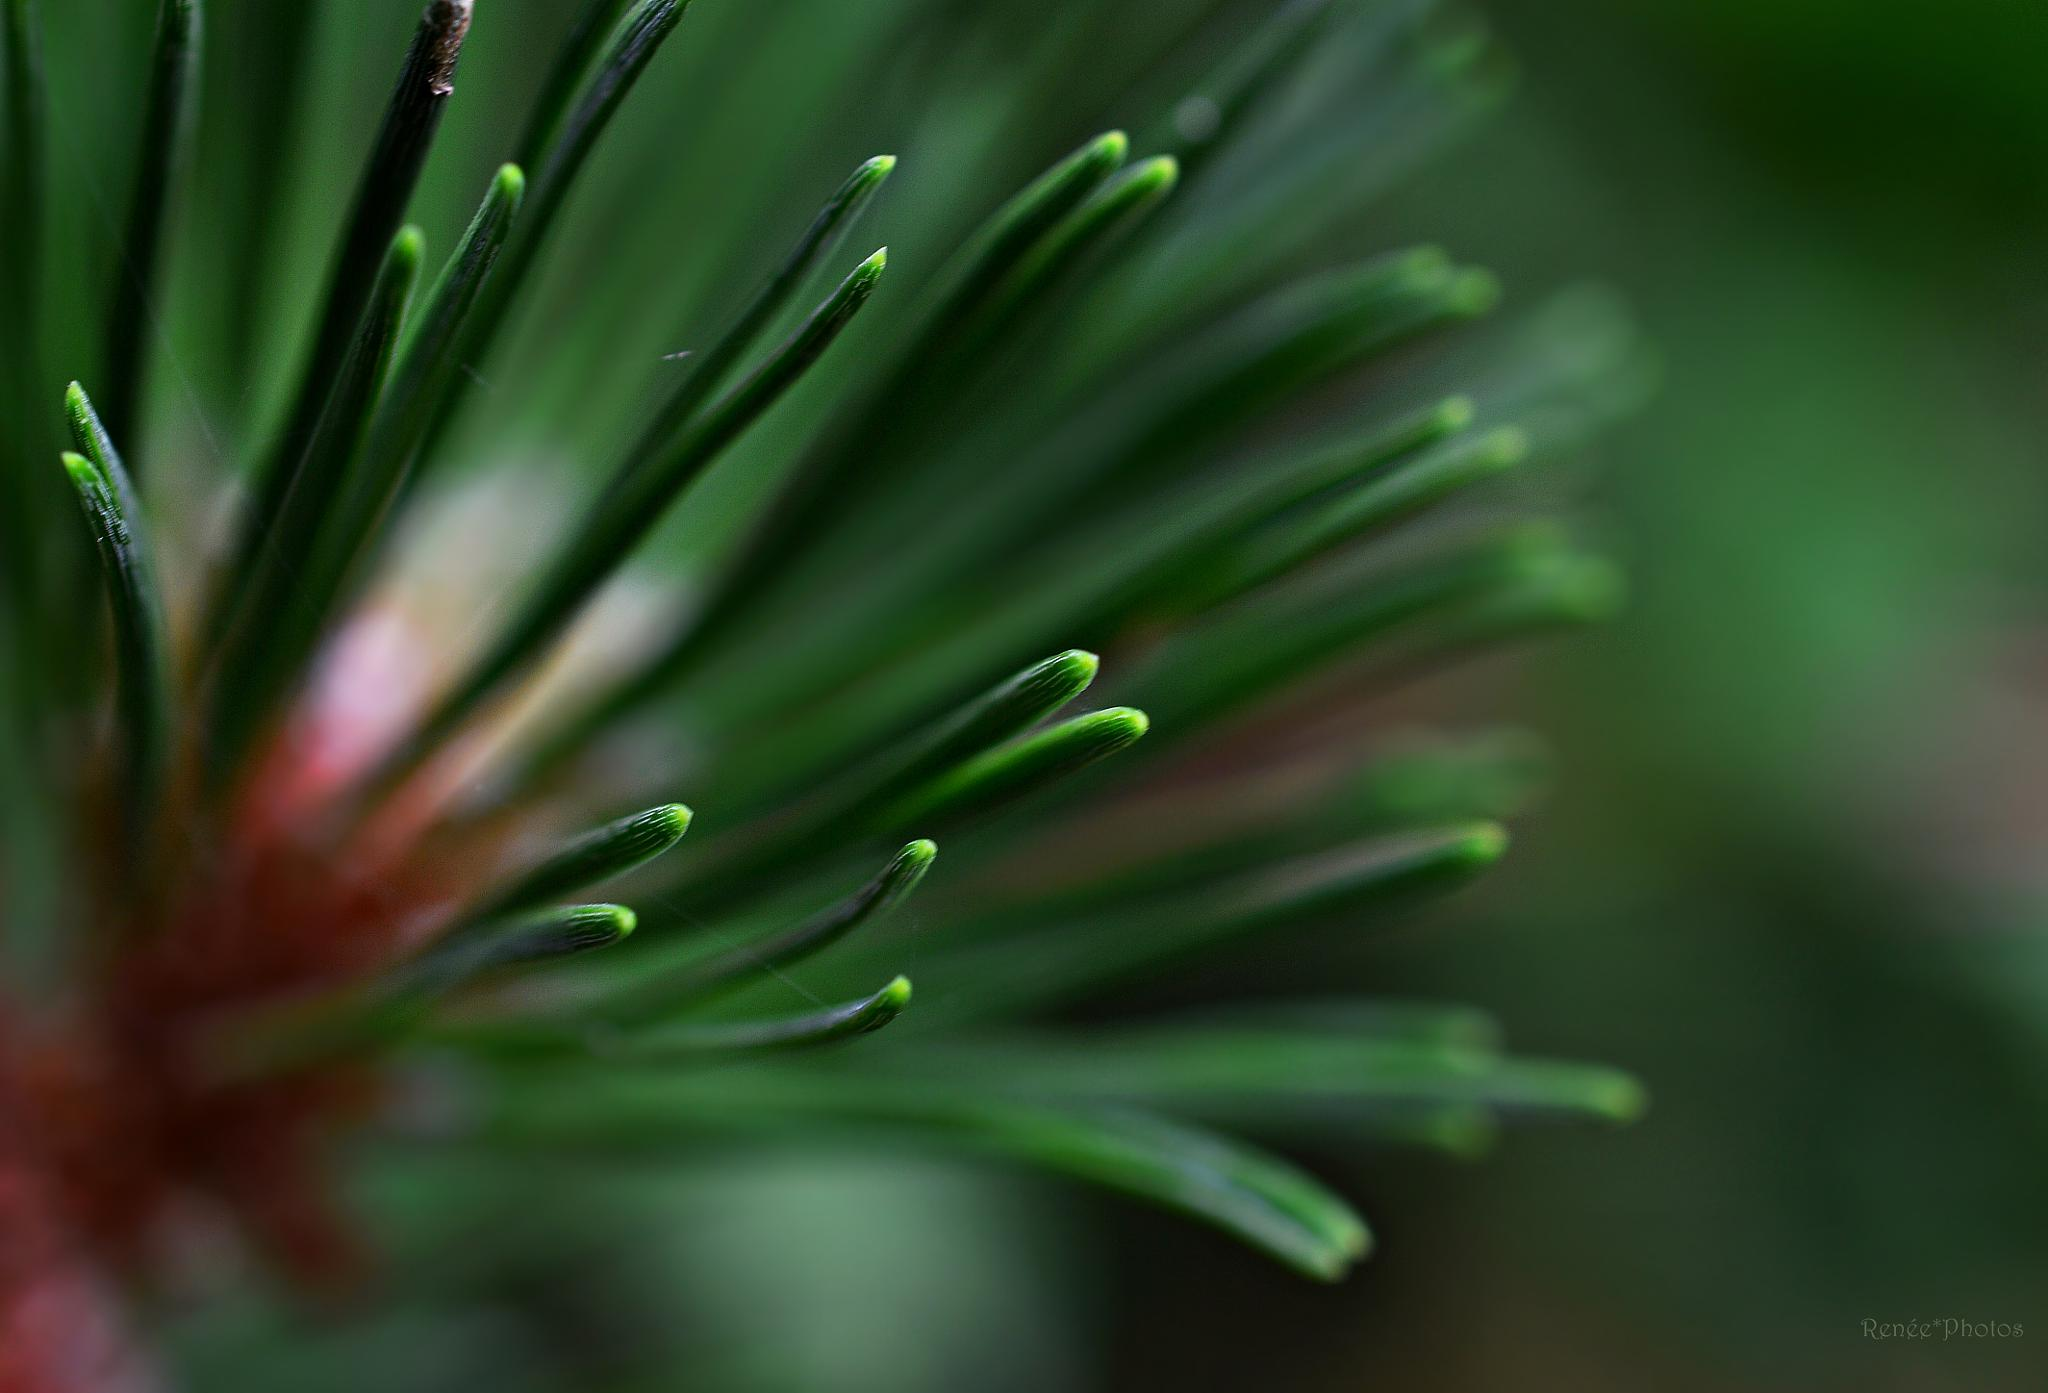 Pine by Renée Köhler